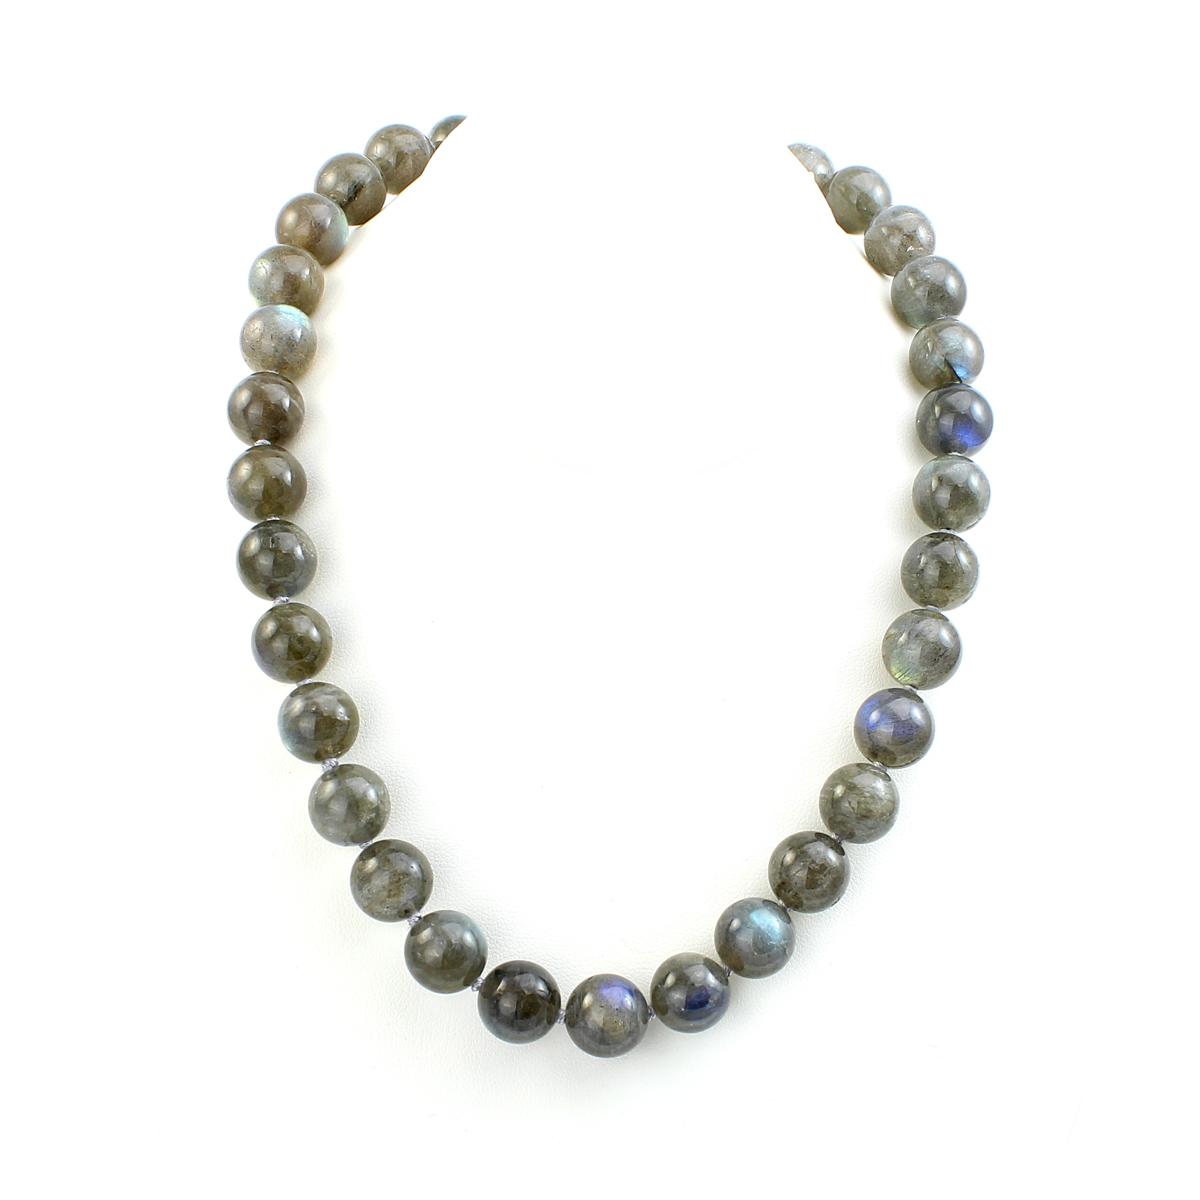 Mazza 12mm Labradorite Bead Necklace